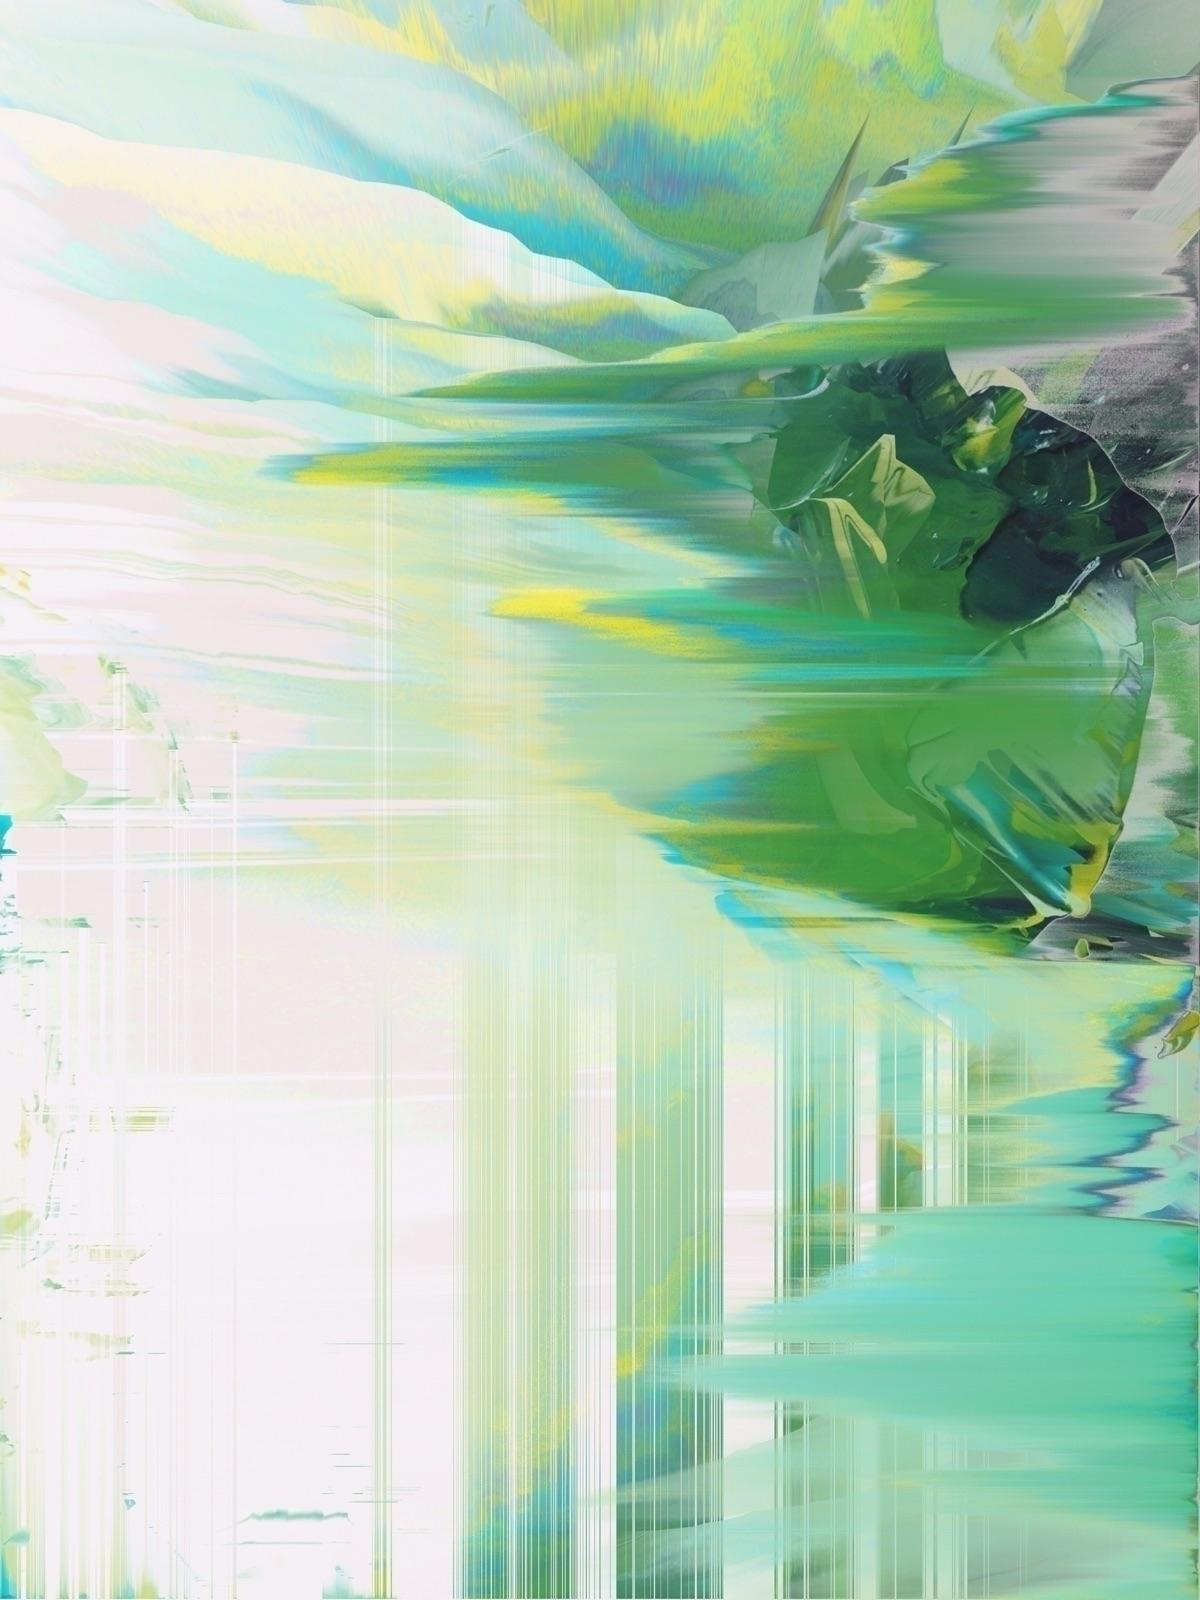 _Imaginary landscape render - p - cgwarex | ello